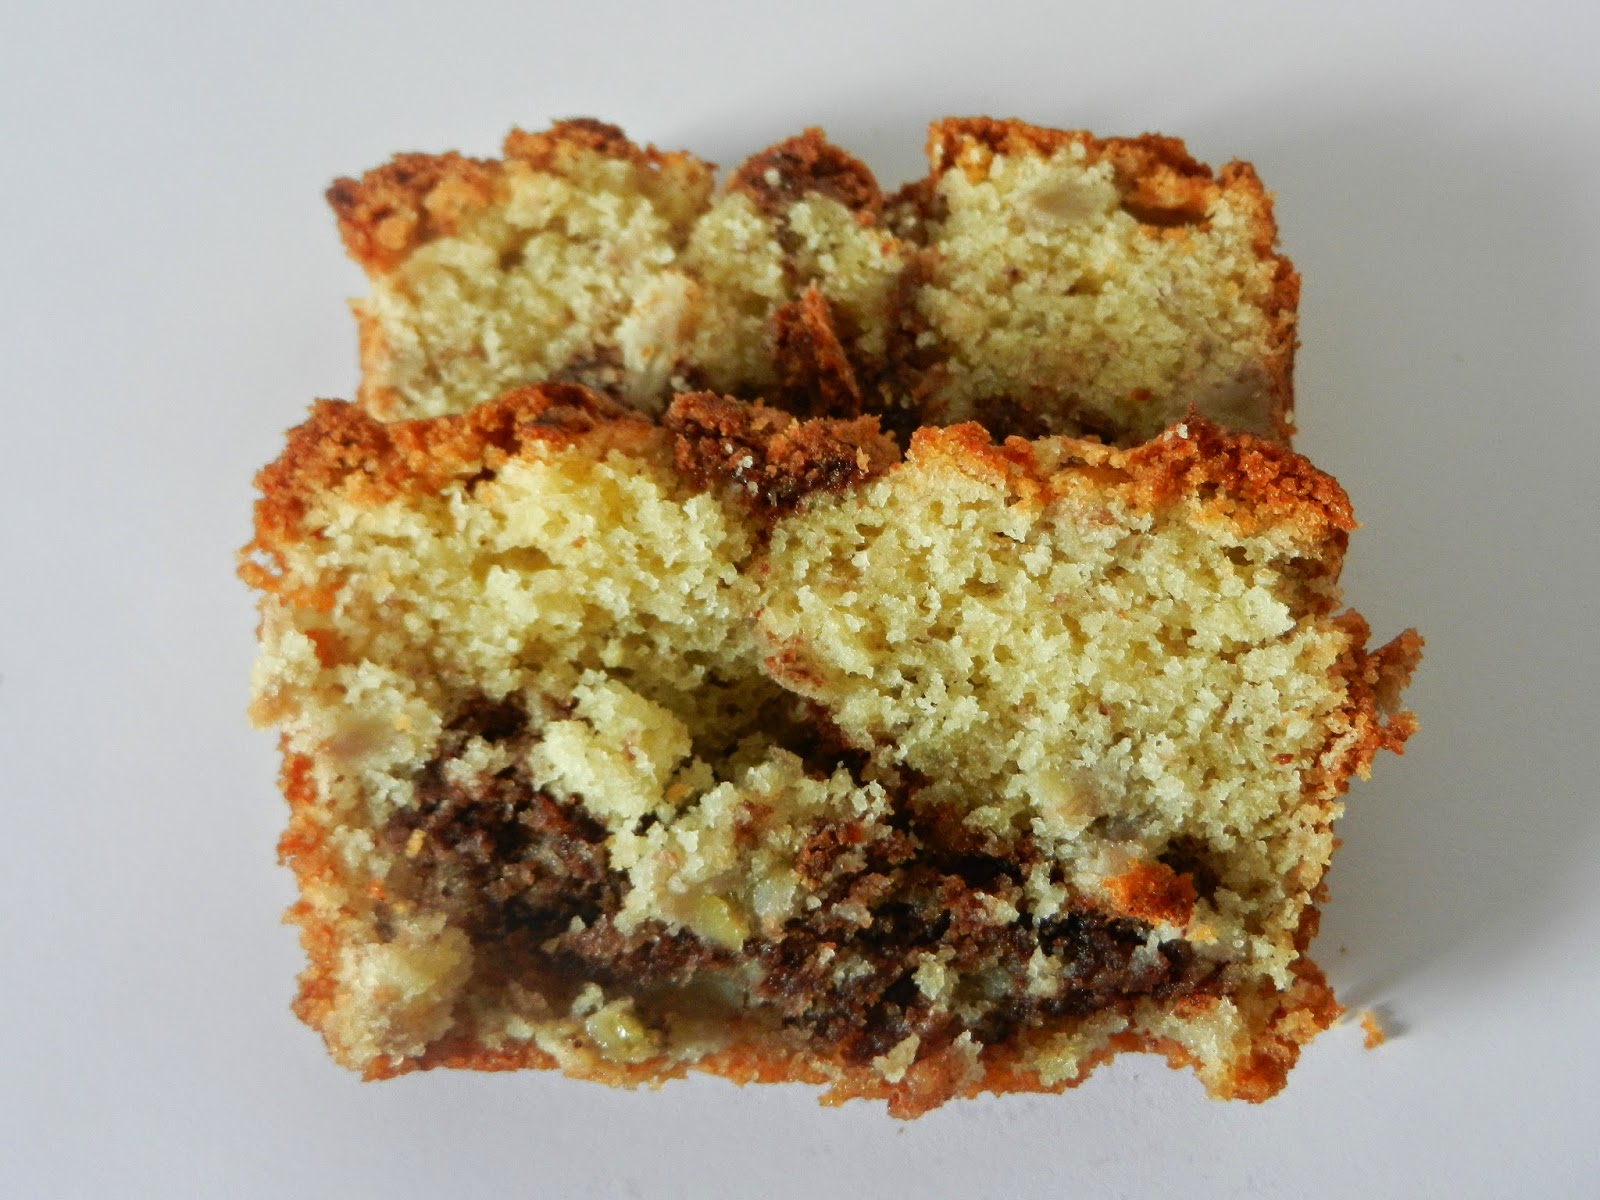 How To Make Golden Butter Cake Mix Better